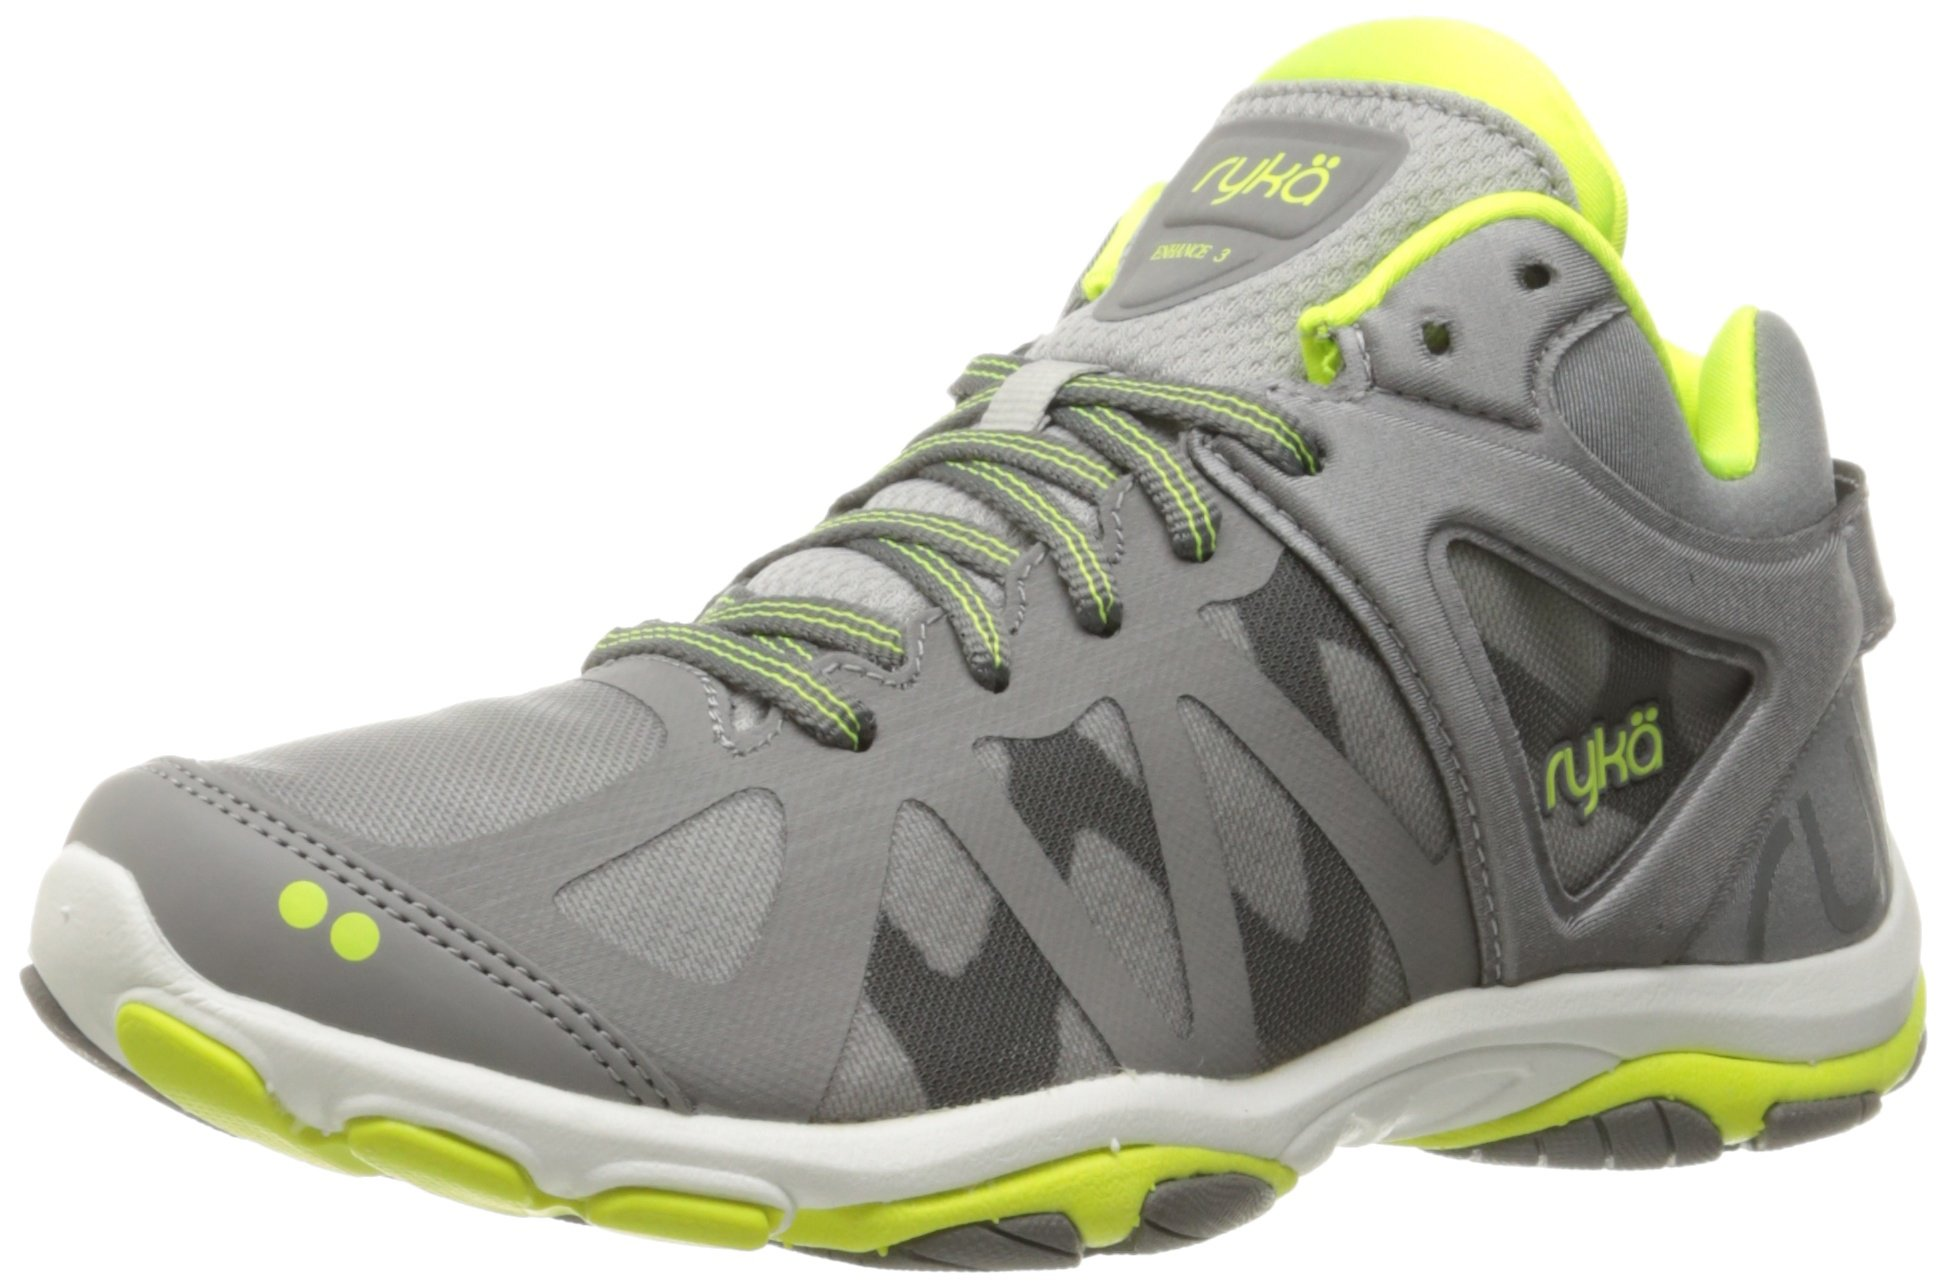 Ryka Women's Enhance 3 Cross-Trainer Shoe, Grey/Lime, 8.5 M US